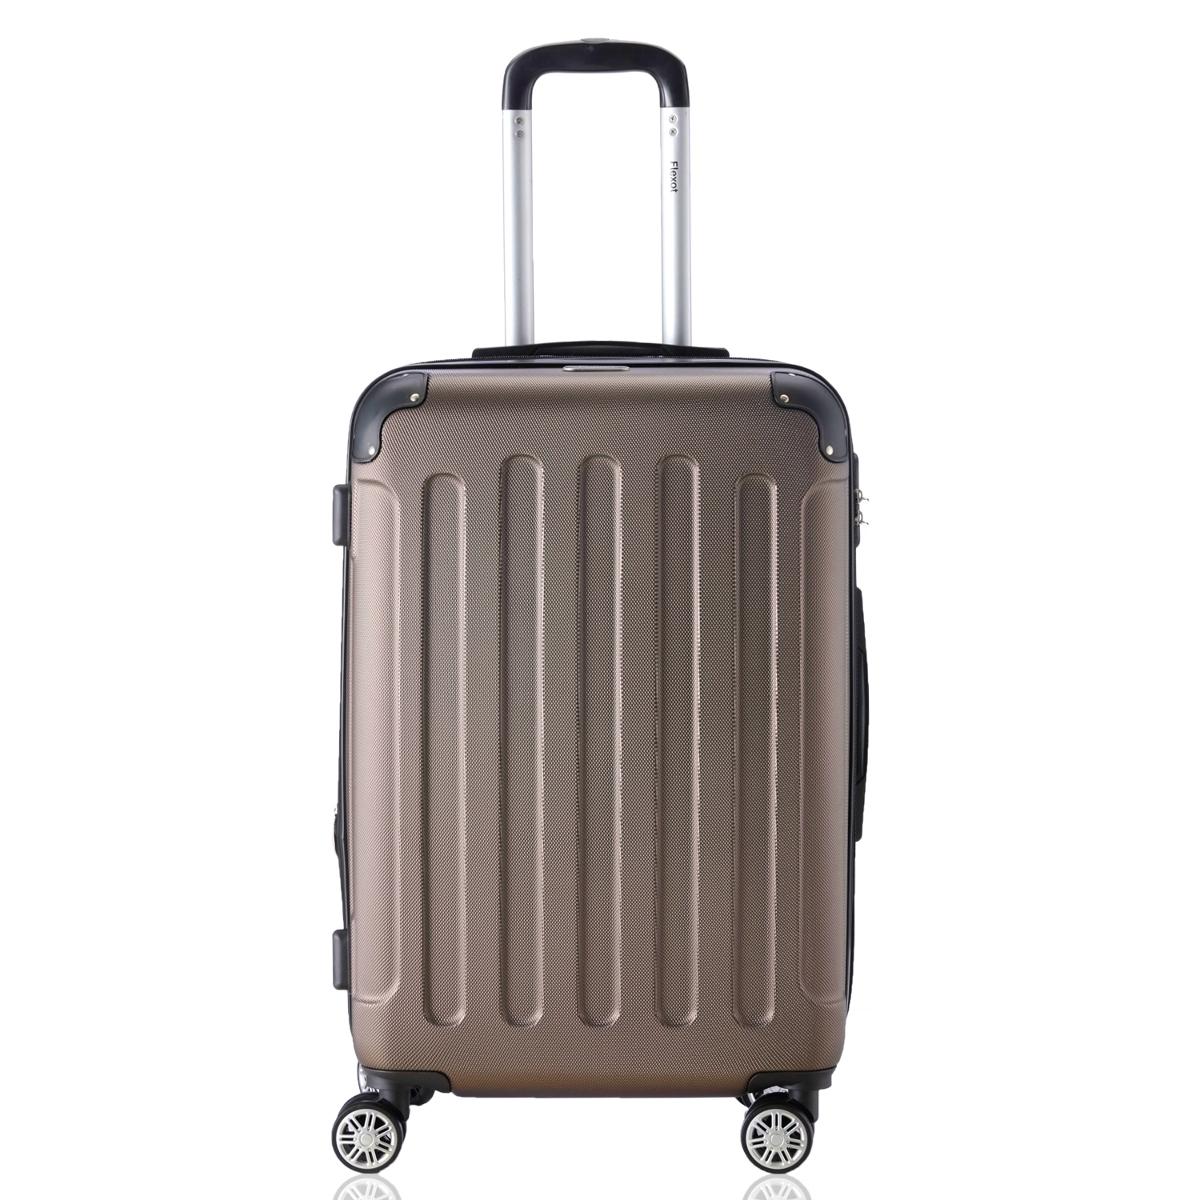 Koffer-Flexot-2045-Hartschalenkoffer-Trolley-Kofferset-Reisekoffer-M-L-XL-Set Indexbild 58